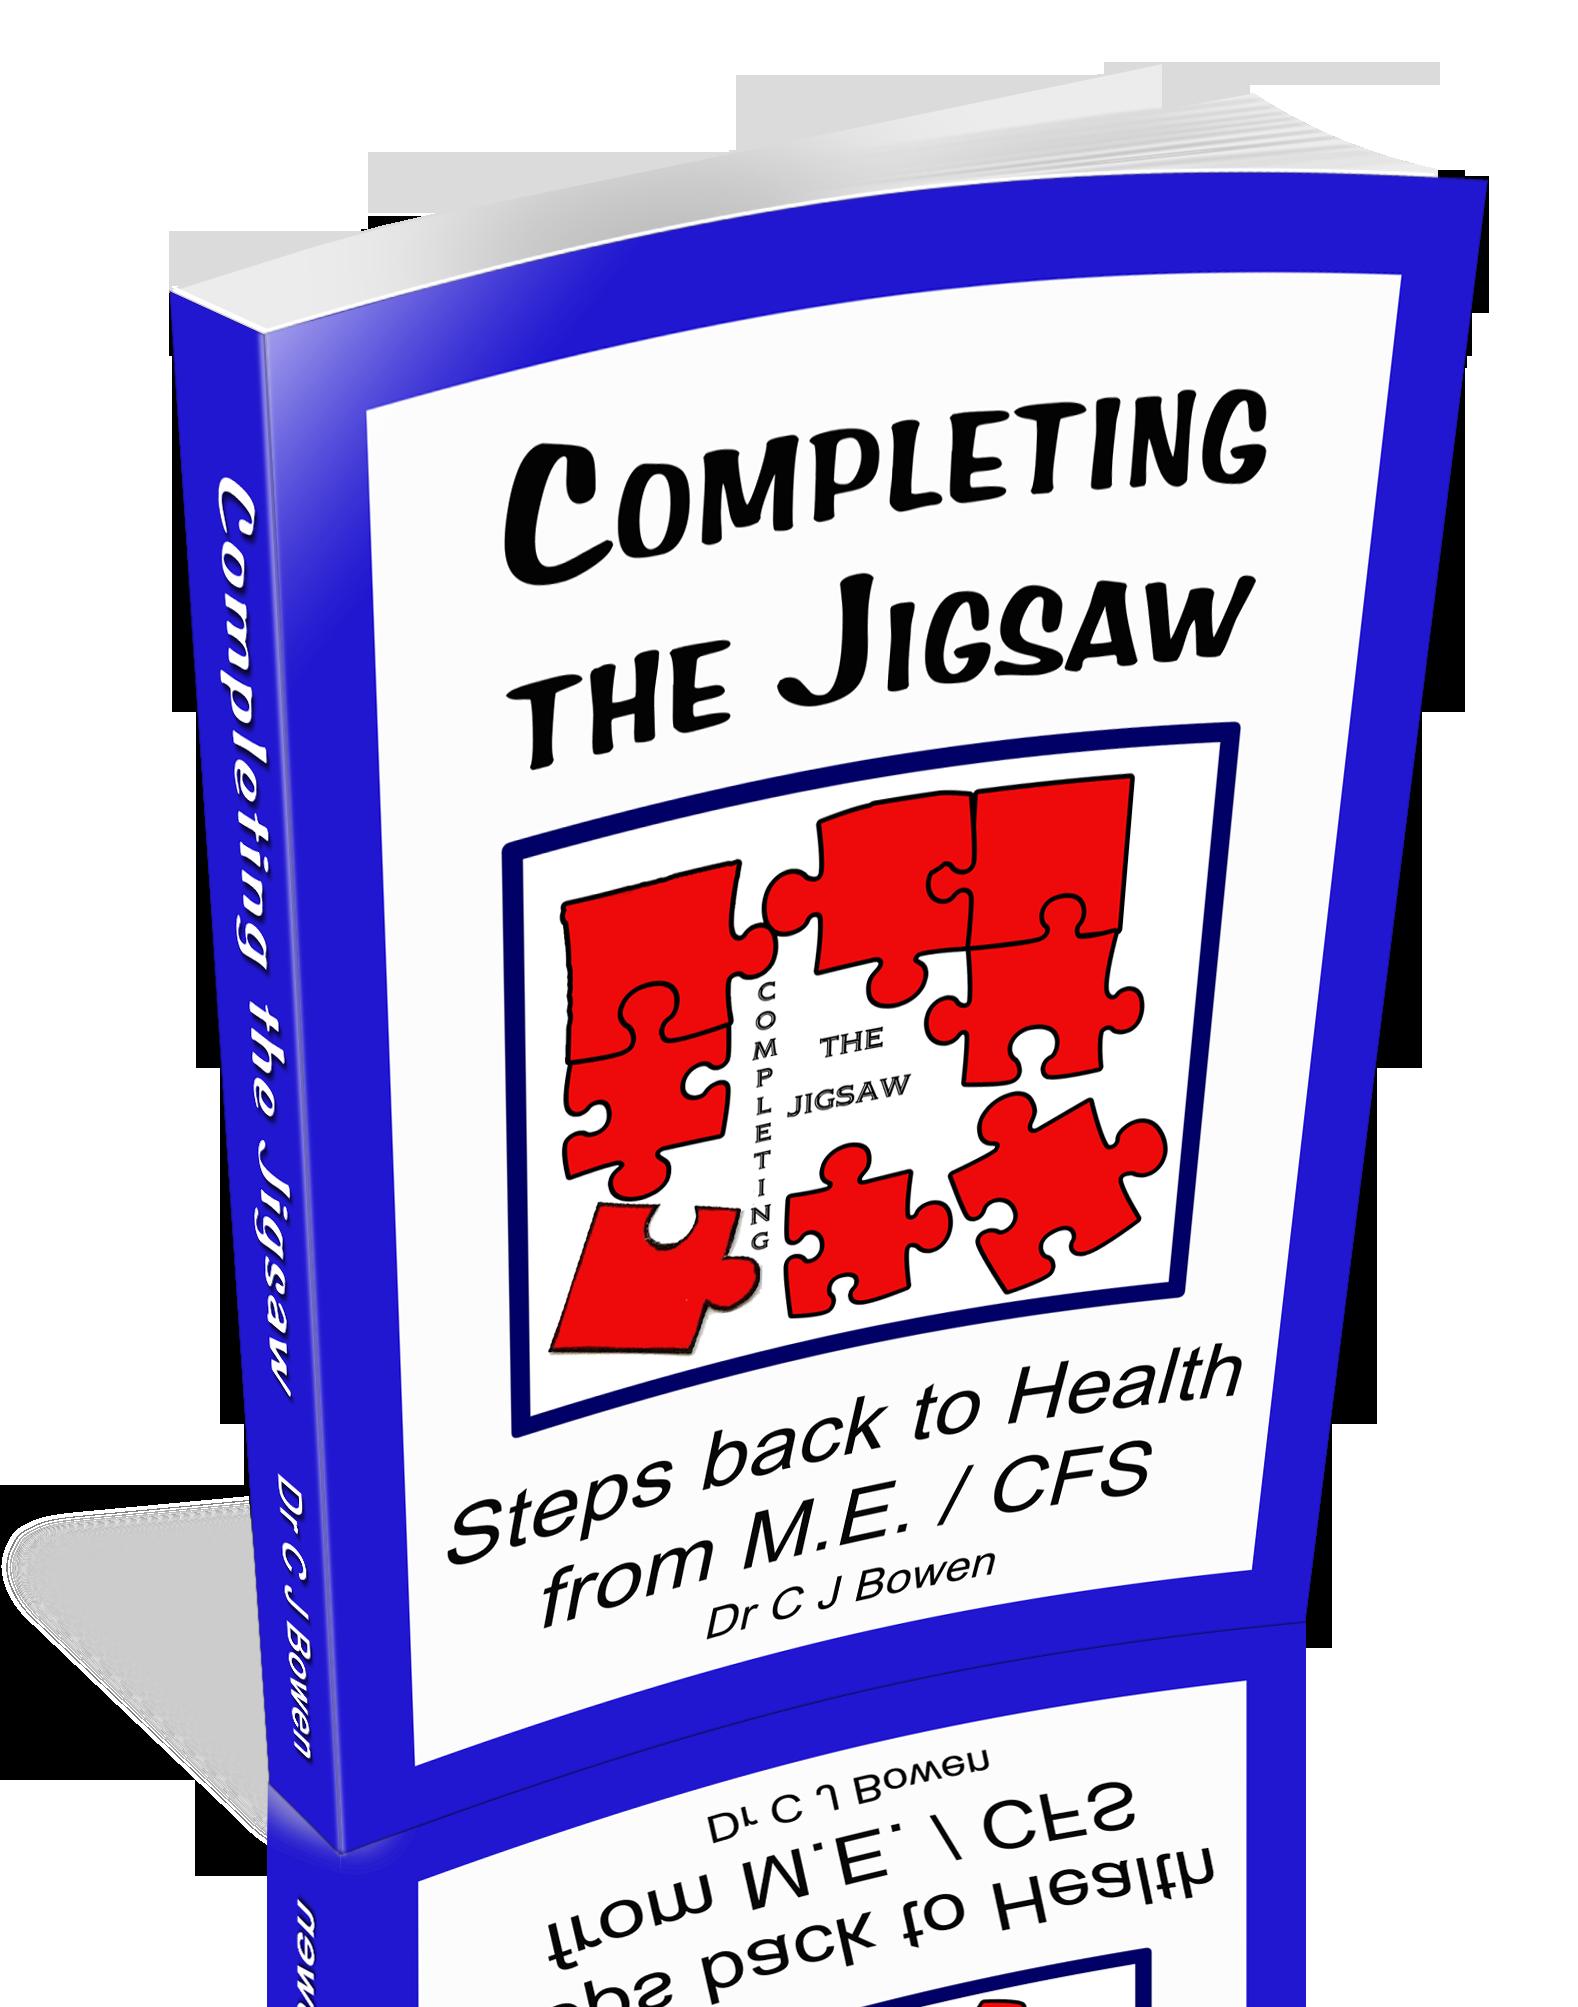 ME CFS Fibromyalgia Recovery Manual